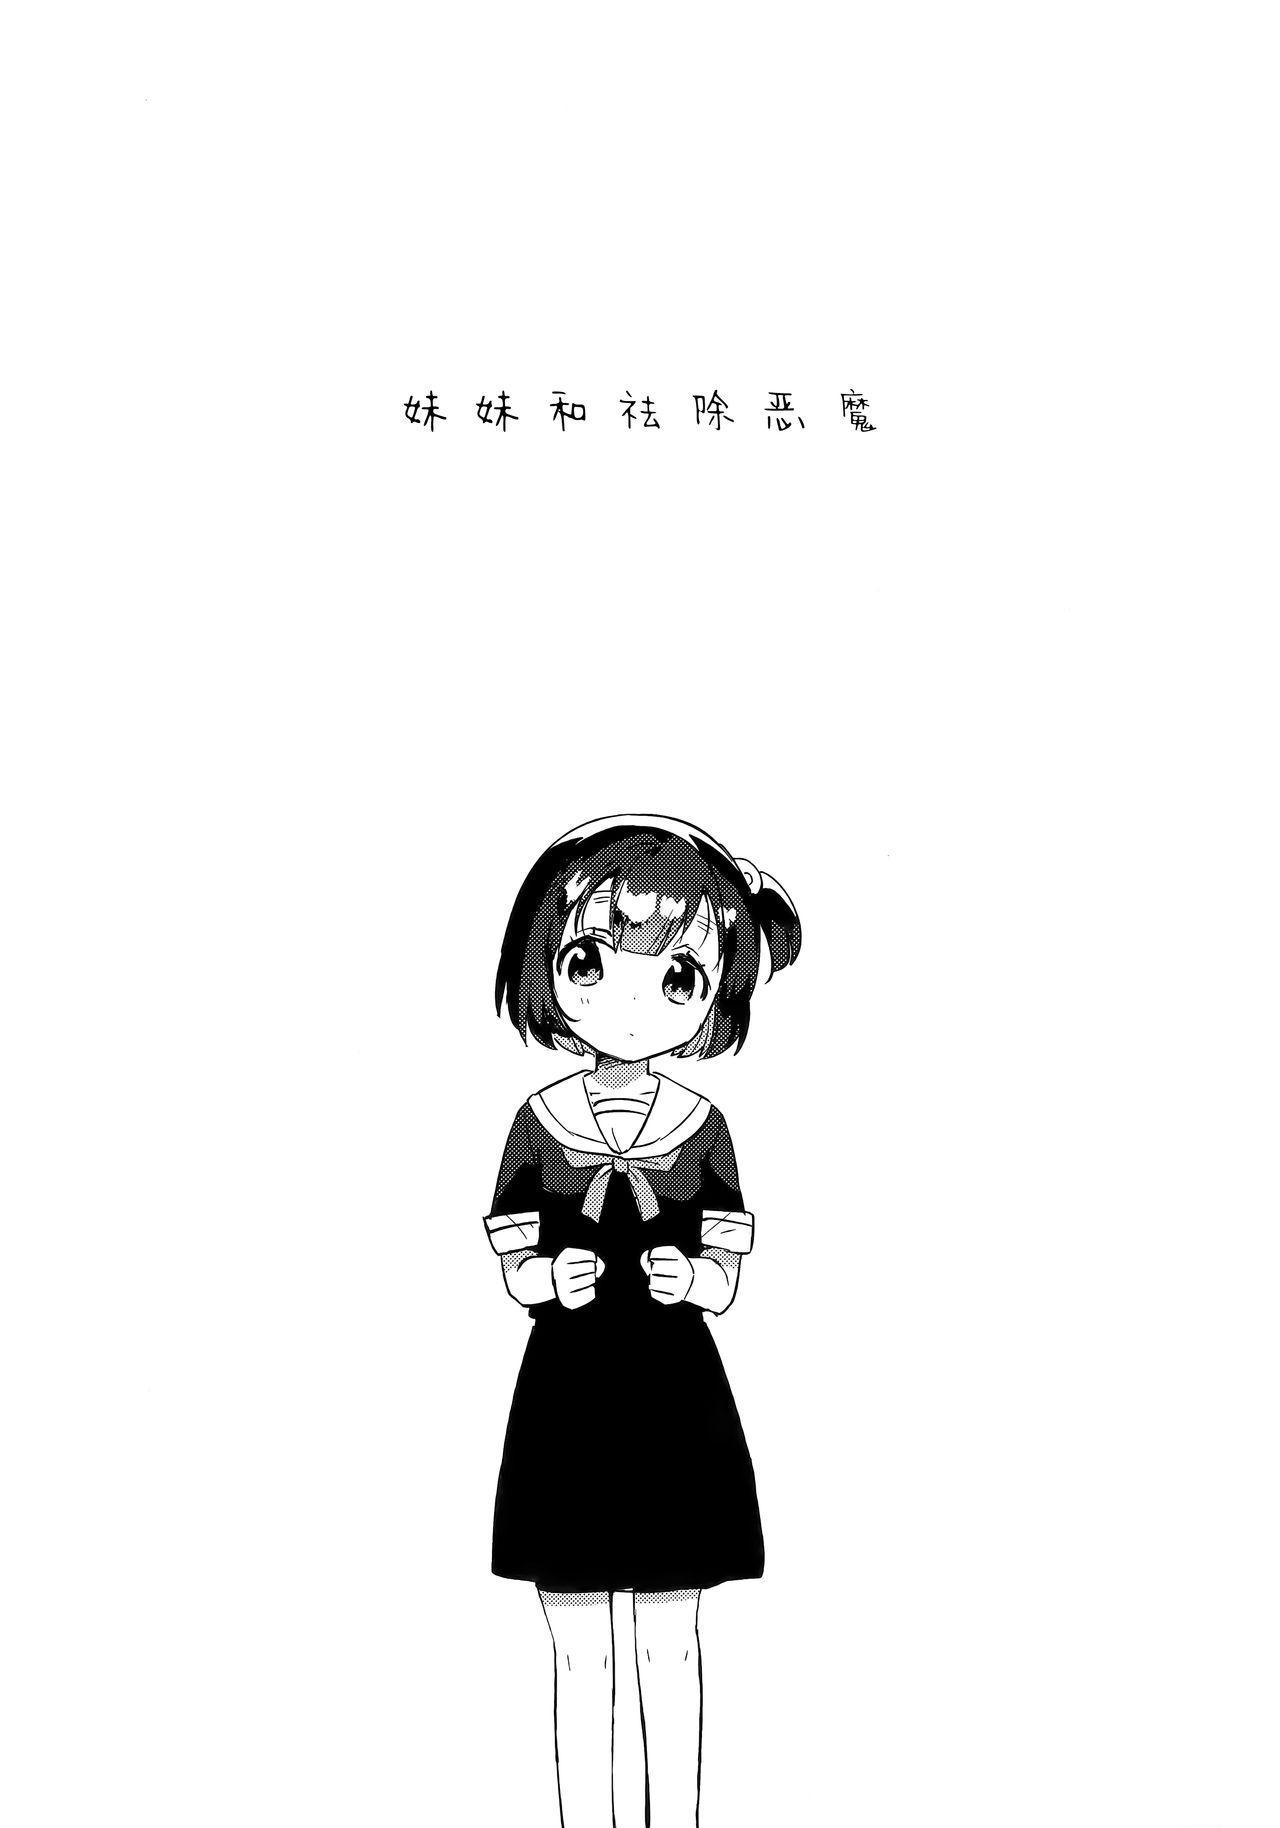 Imouto to Akumabarai 4